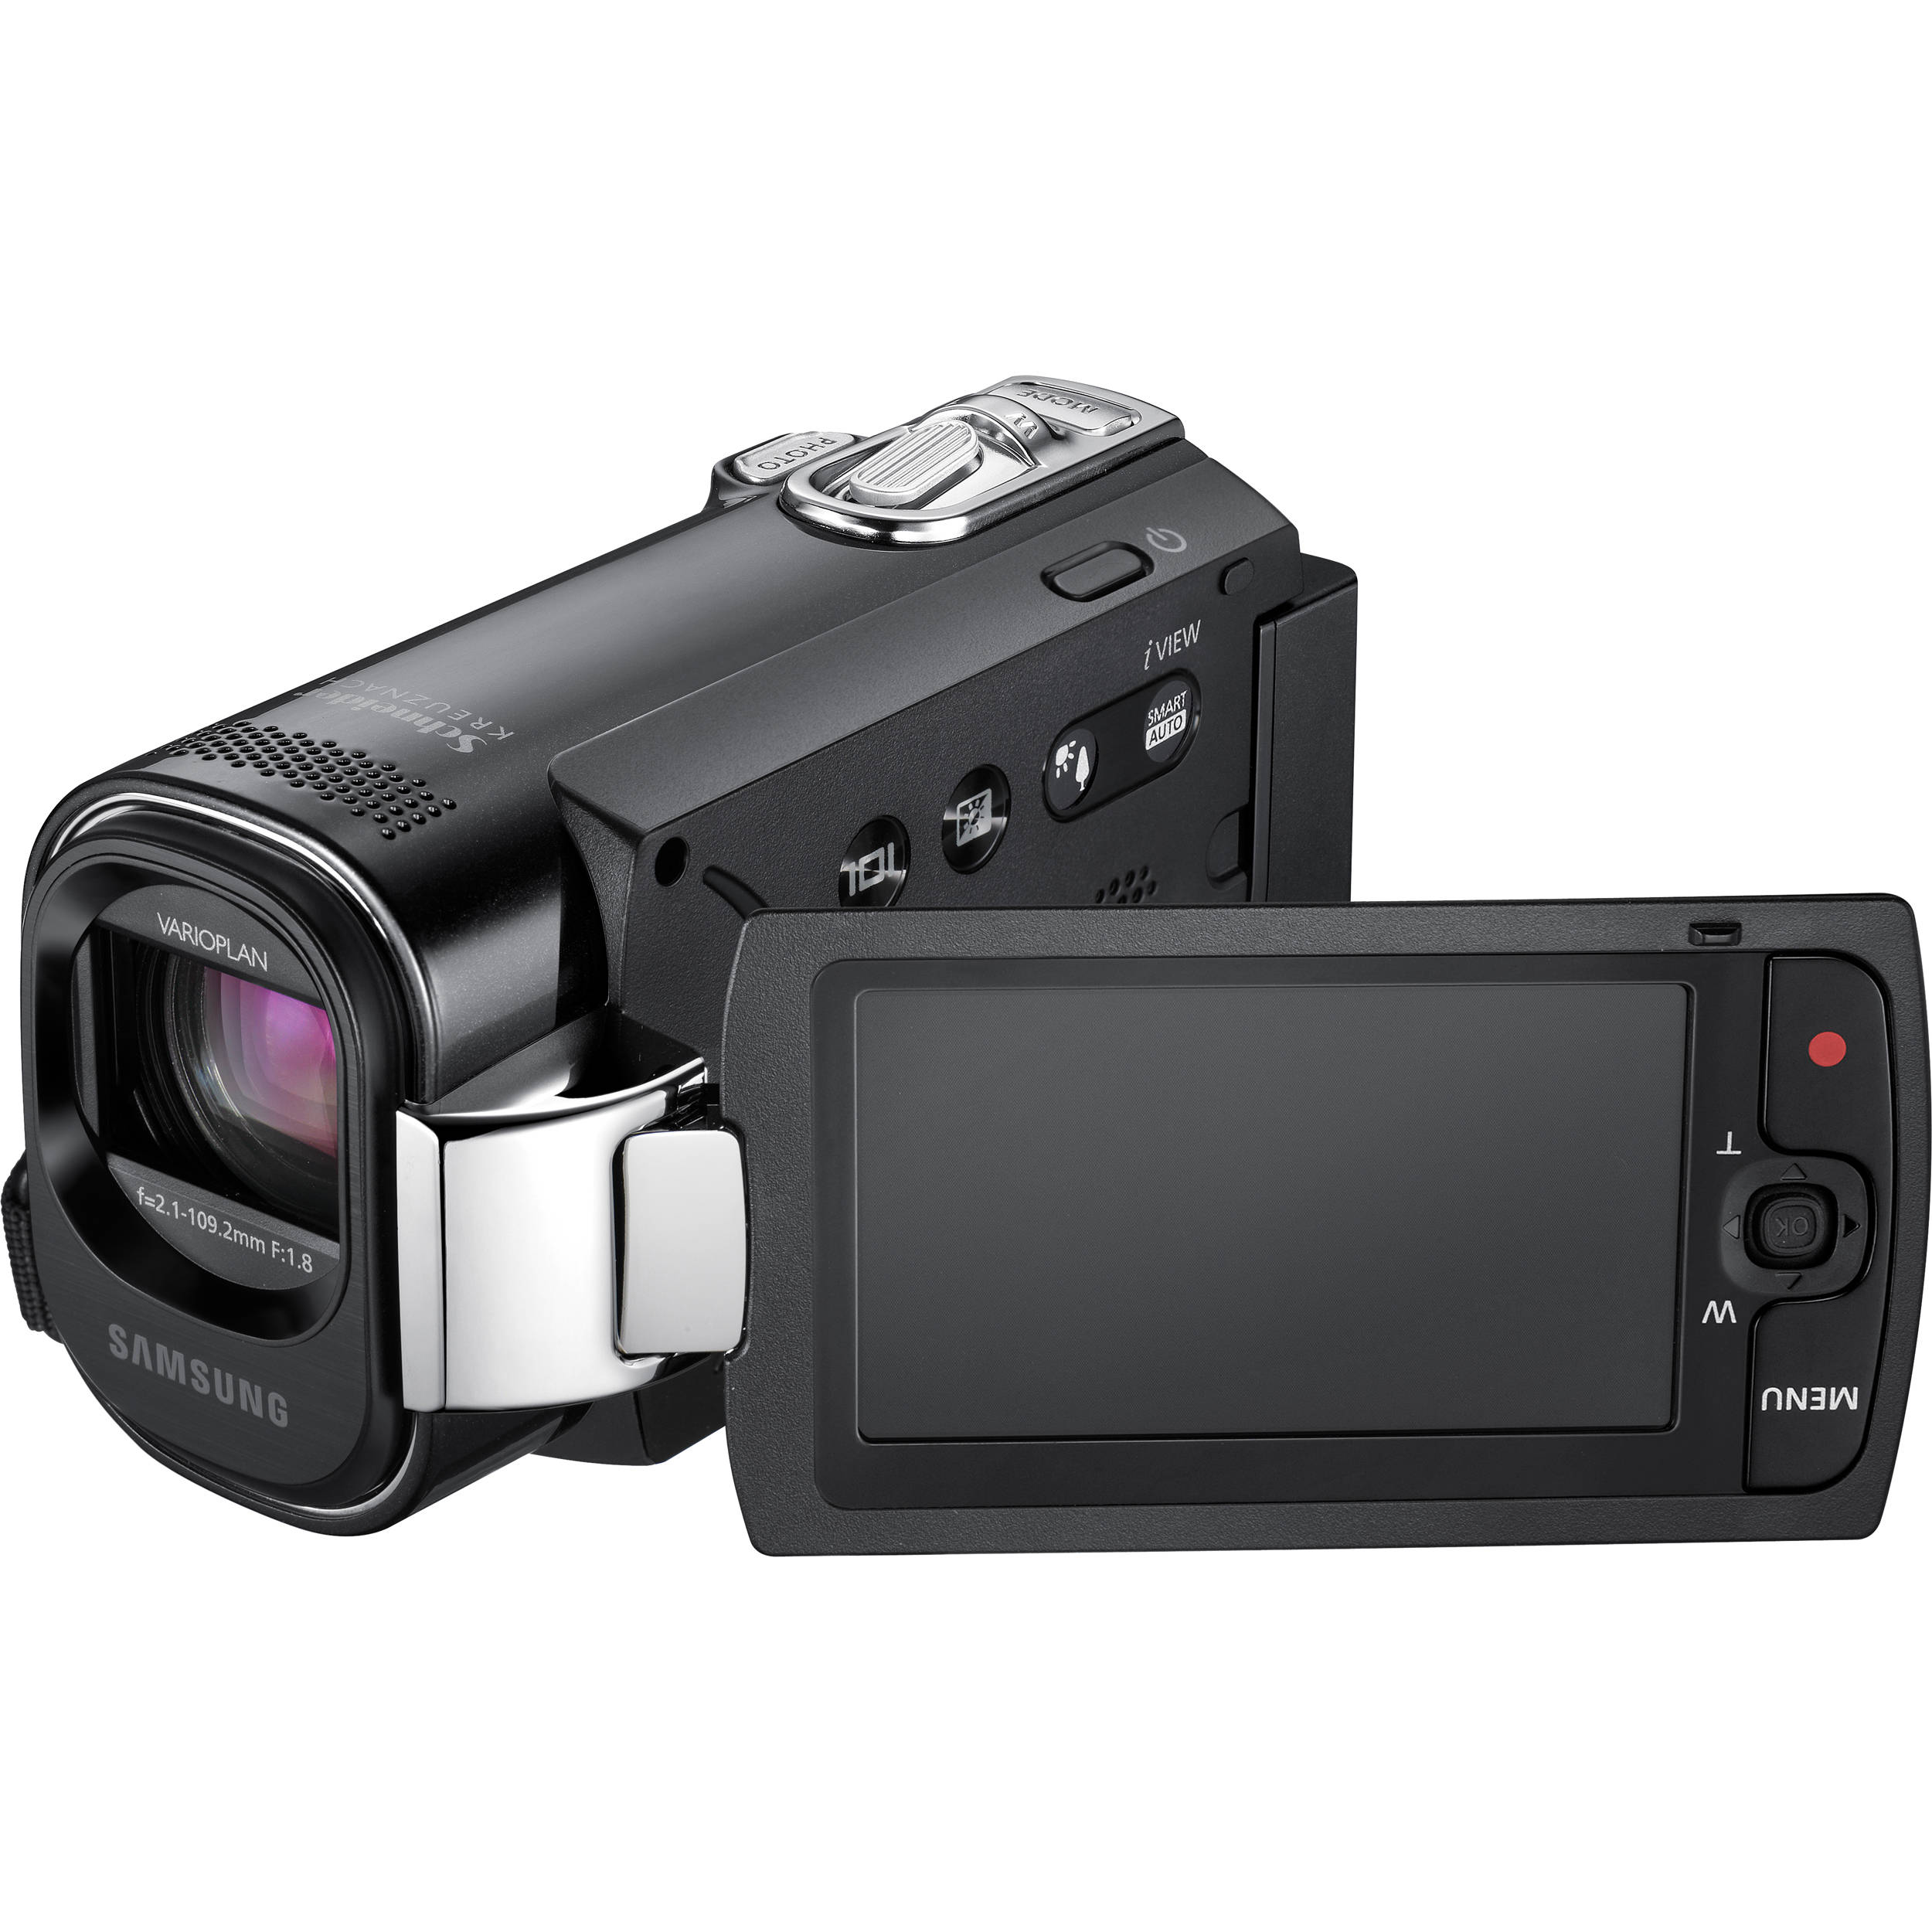 samsung smx f43 digital memory camcorder smx f43bn xaa b h photo rh bhphotovideo com Samsung Hyper Dis 65X Manual samsung flash memory sd camcorder 65x manual